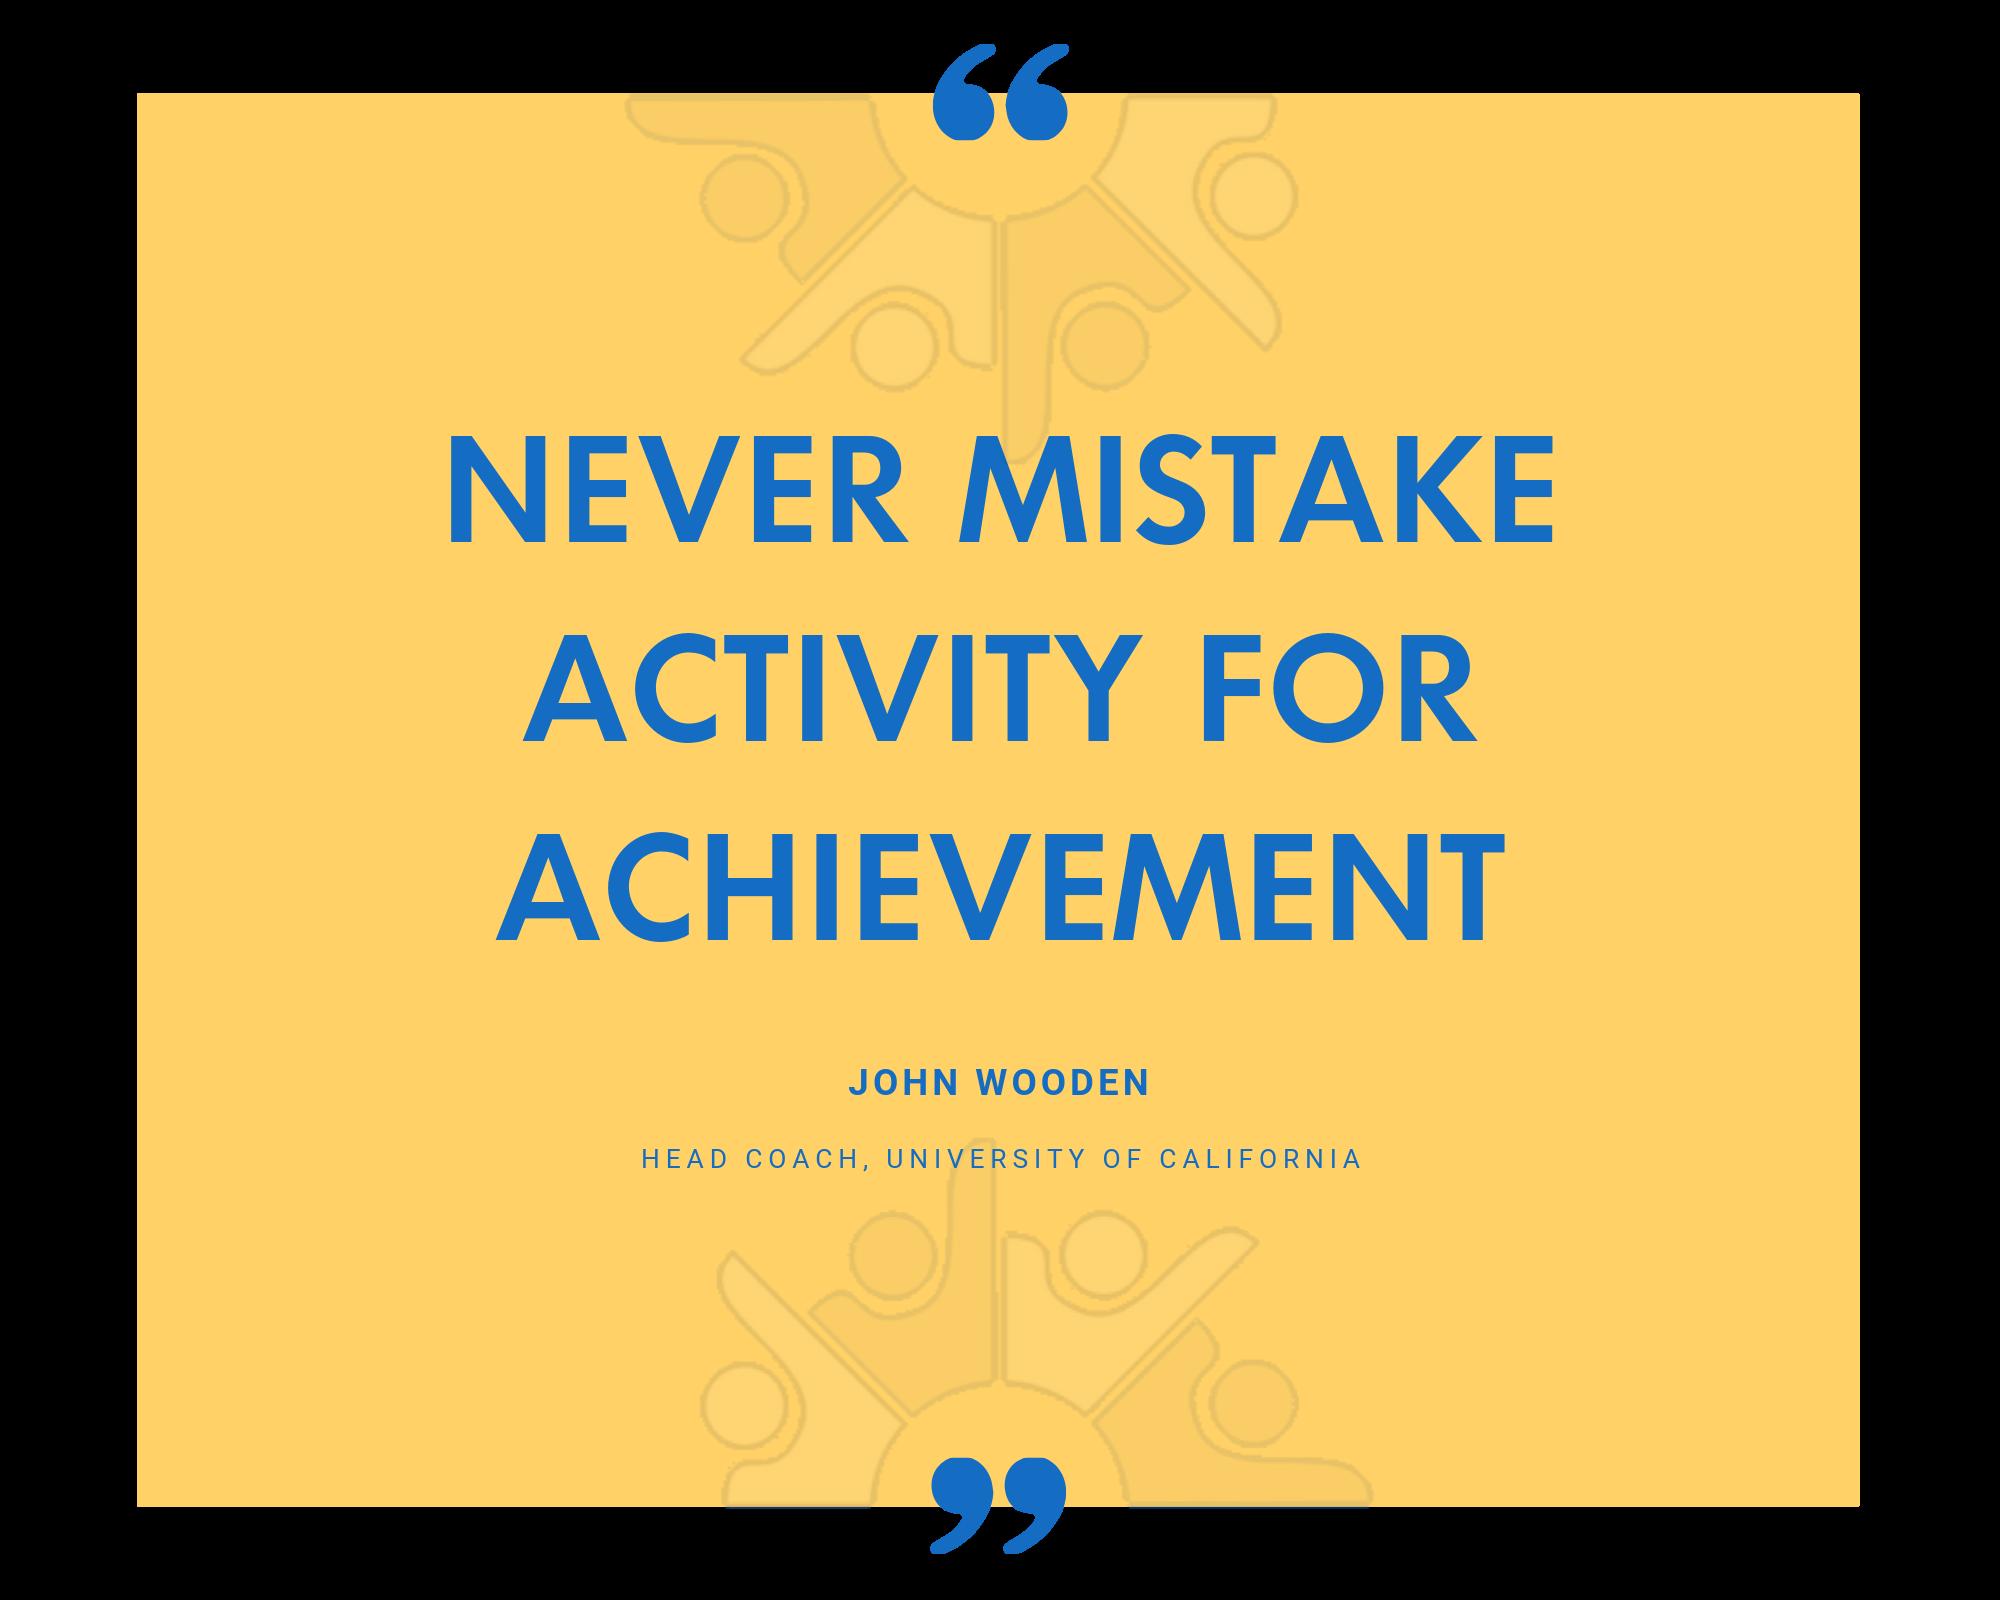 Copy NEVER MISTAKE ACTIVITY FOR ACHIEVEMENT